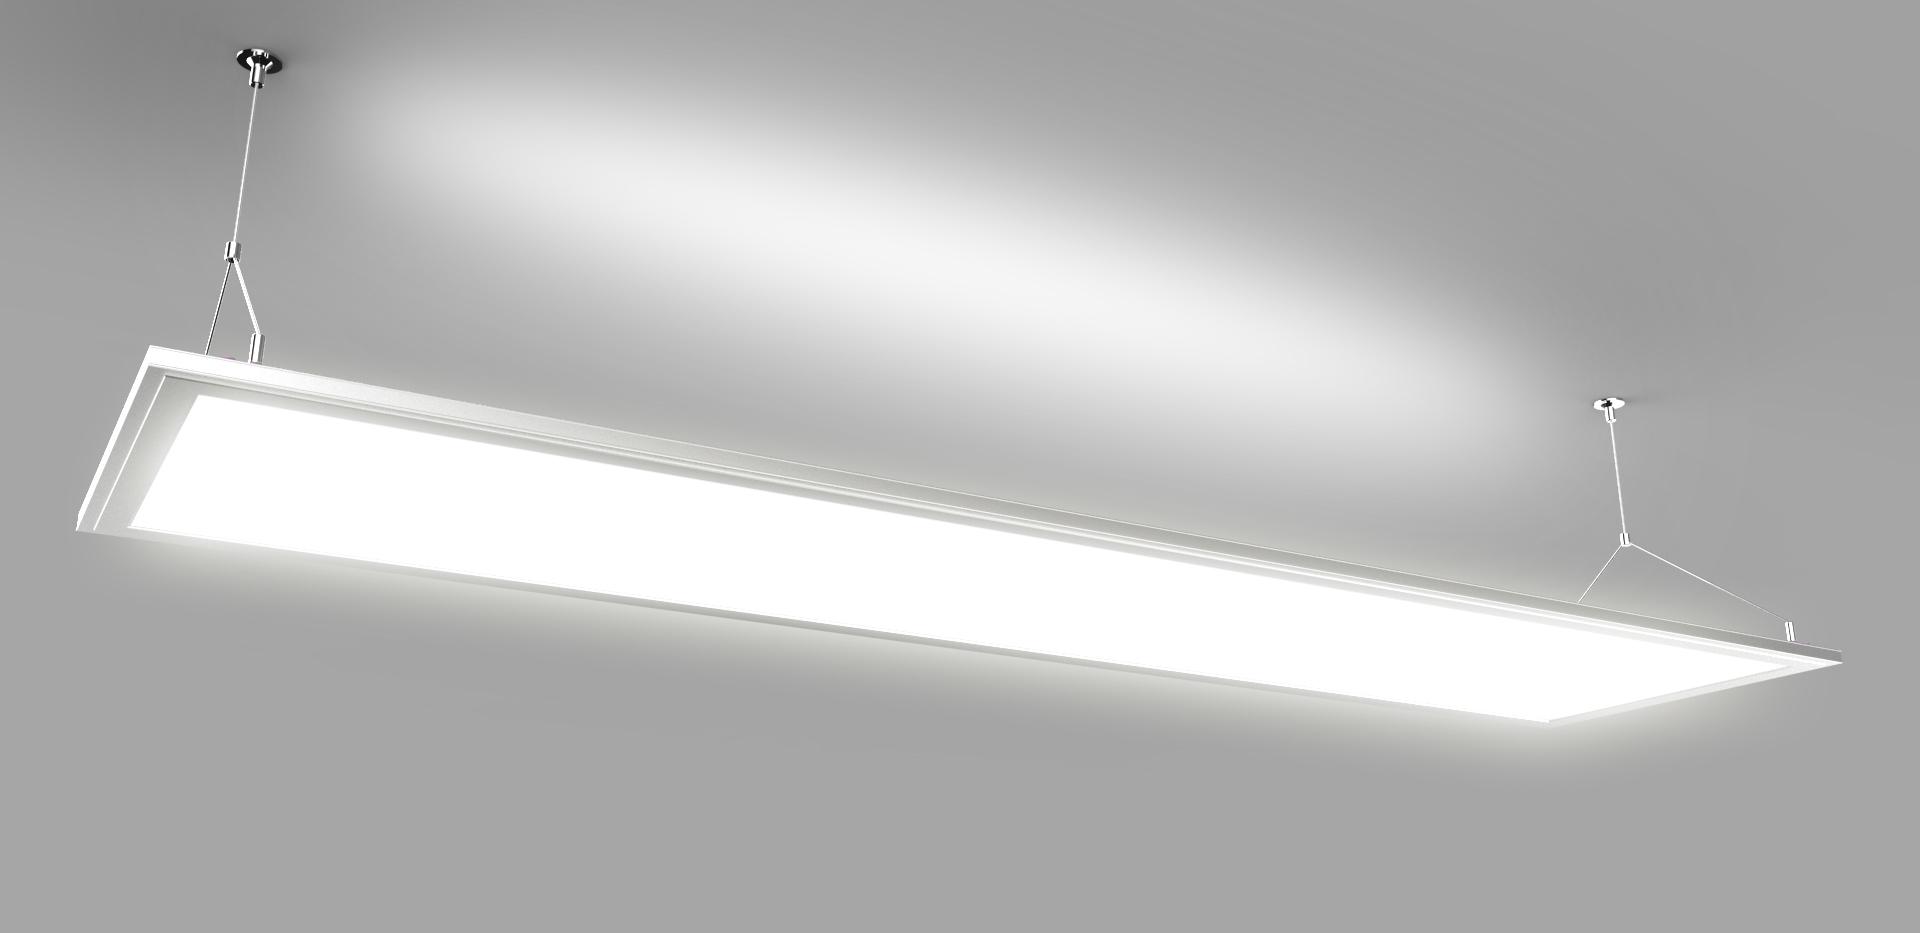 Musteranlagen Led Beleuchtung Smart Mit Led